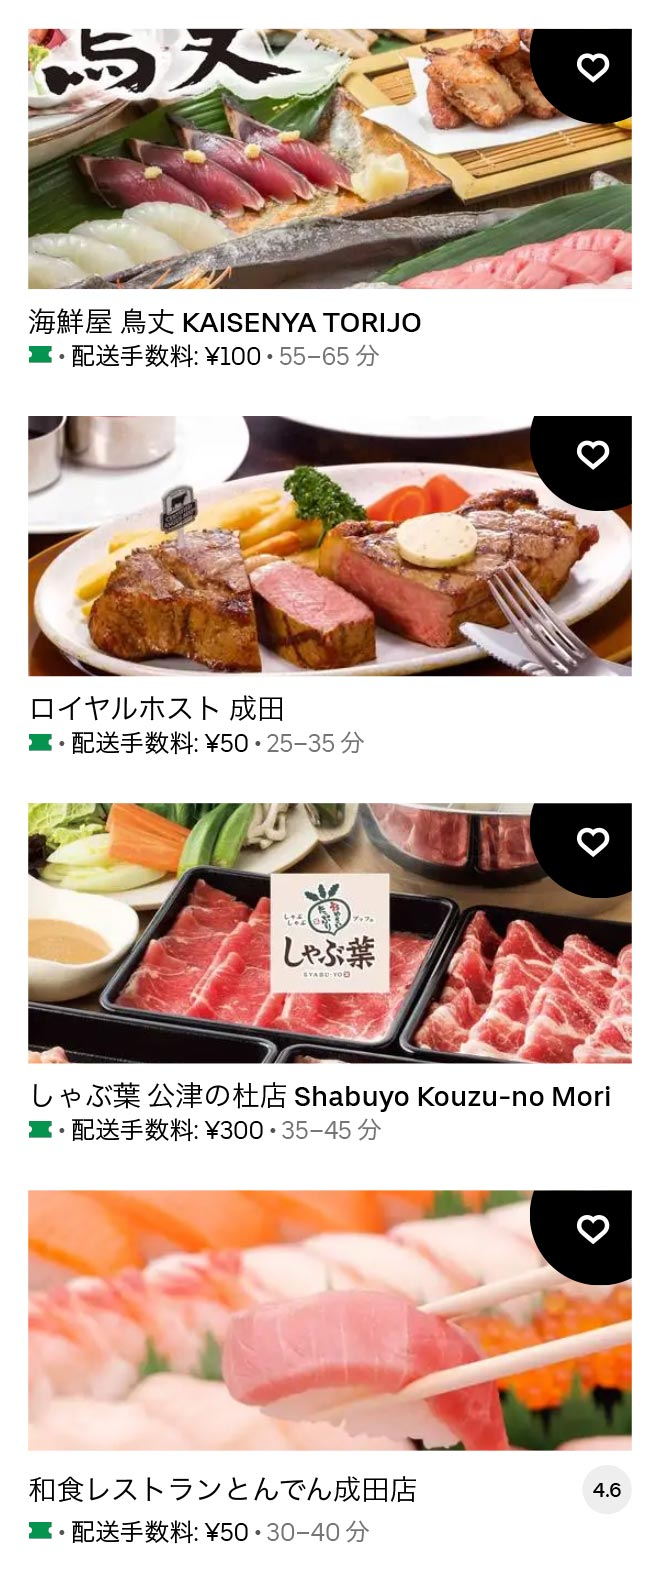 U narita menu 2104 11